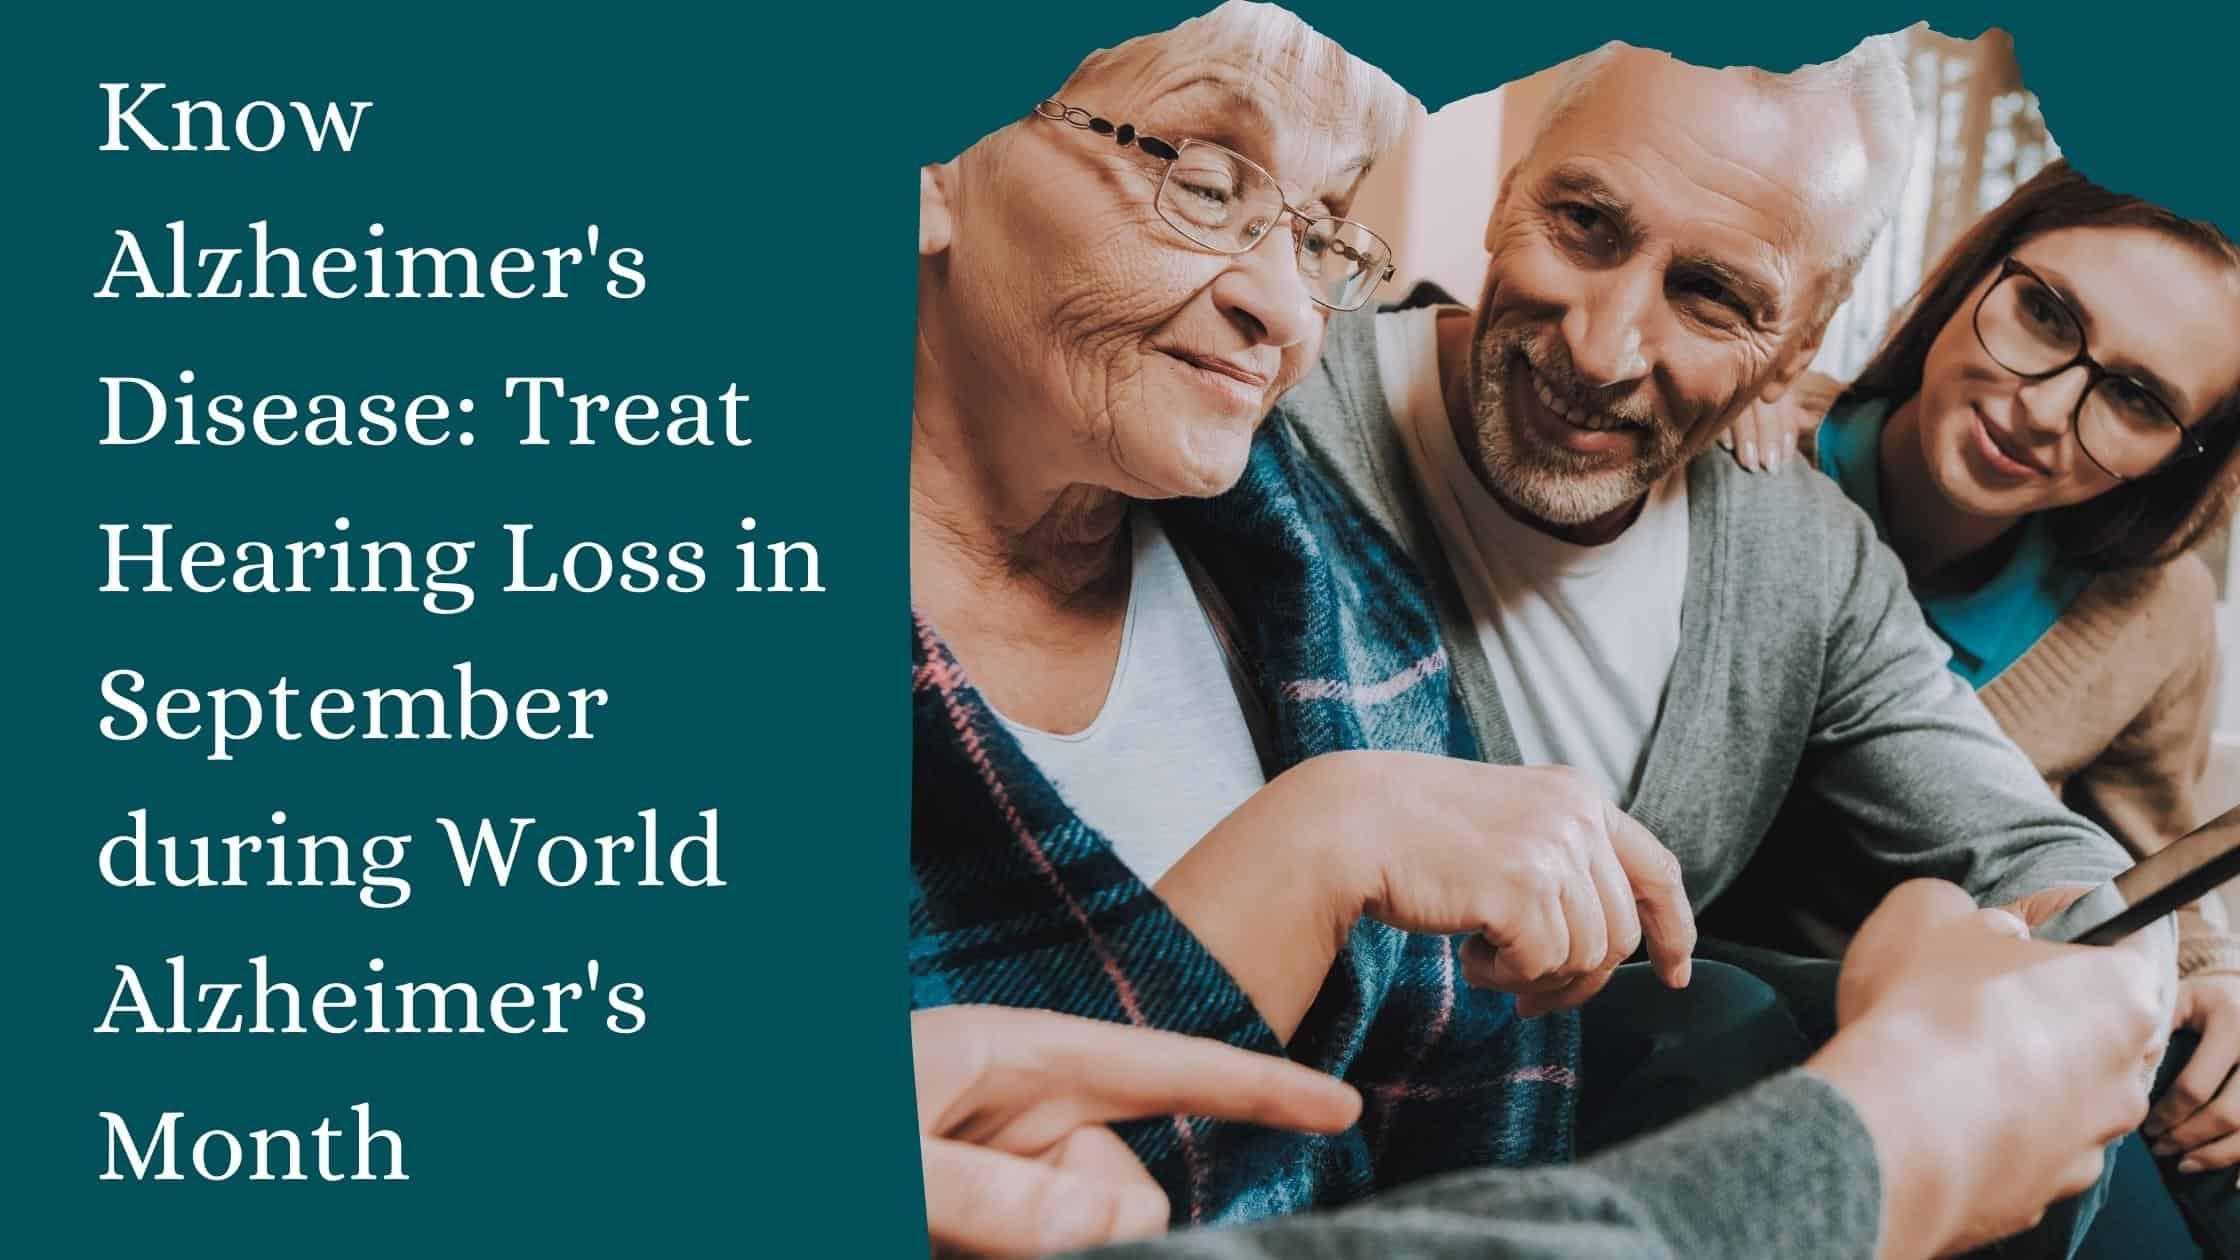 Know Alzheimer's Disease Treat Hearing Loss in September during World Alzheimer's Month(5)